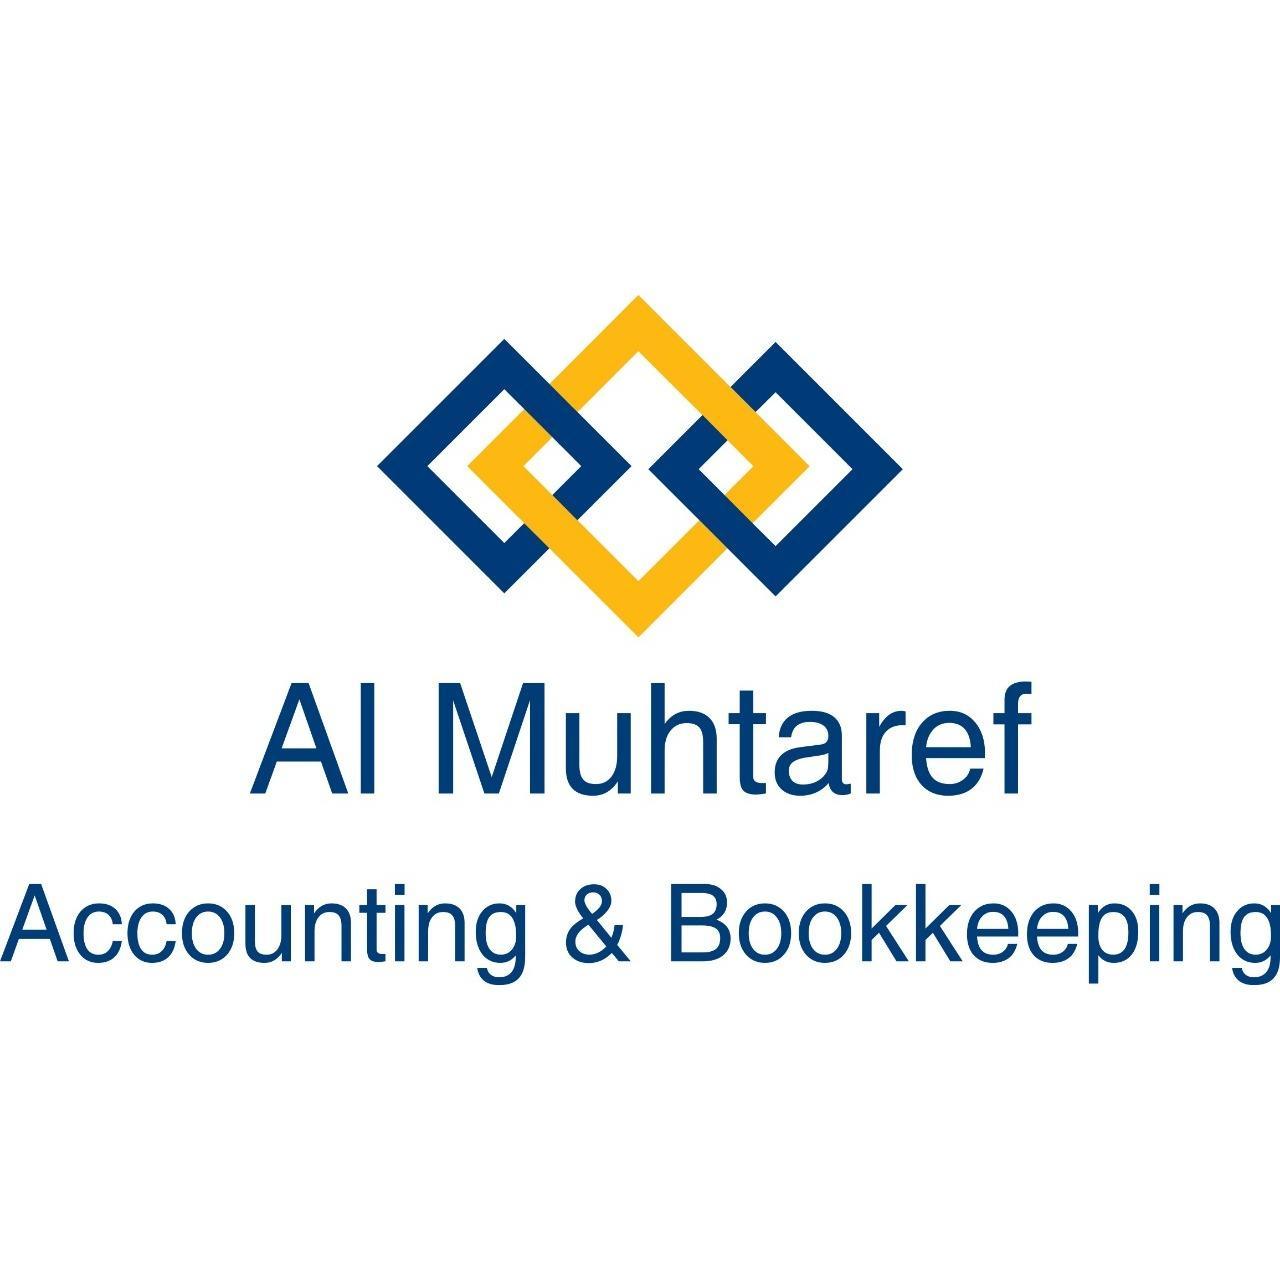 Al Muhtaref Accounting & Bookkeeping